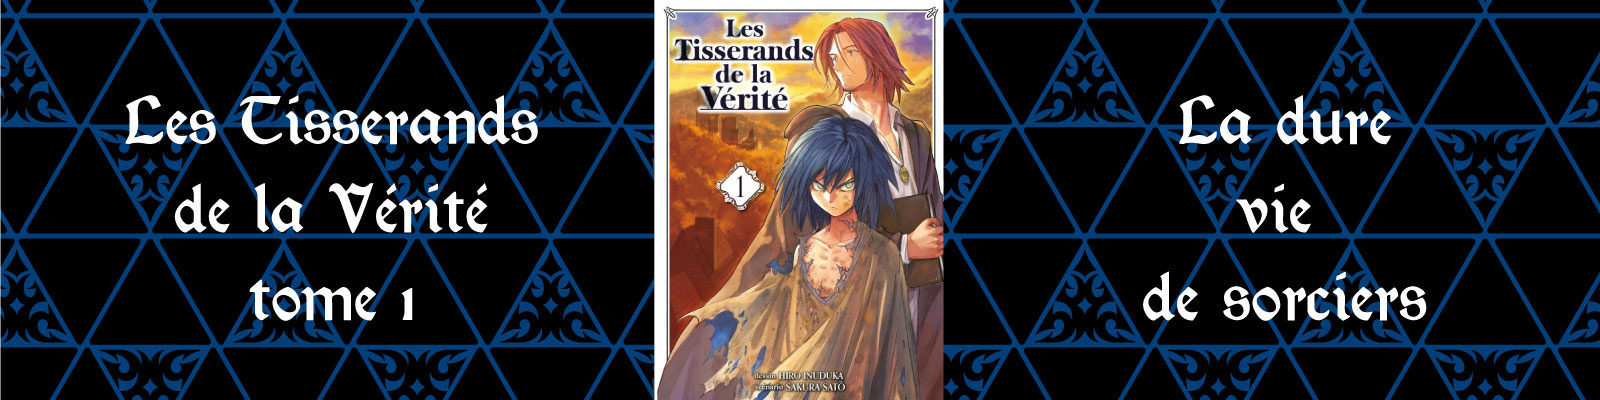 Les Tisserands de la Vérité-Vol.-1